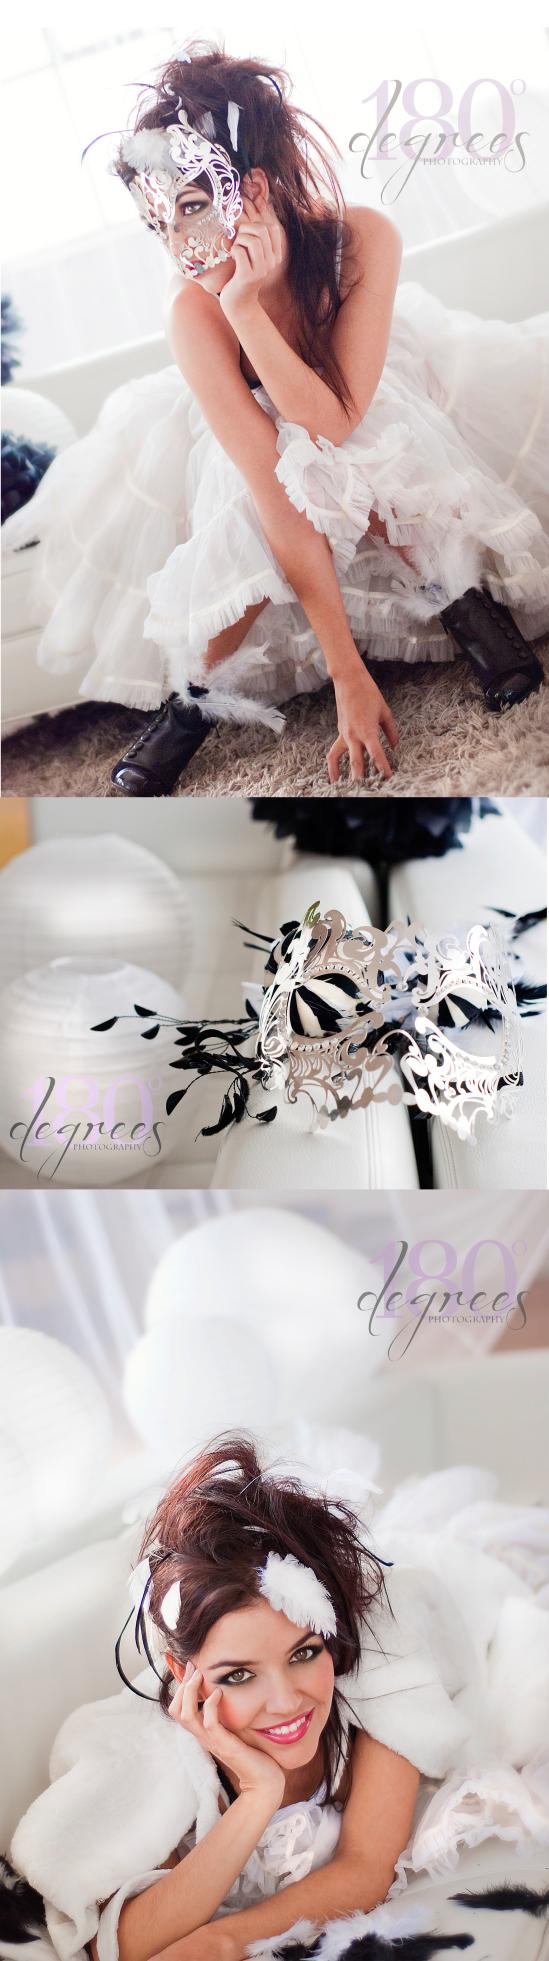 Pinterest Fun~ | Pinterest | Weddings, Masquerade wedding and ...